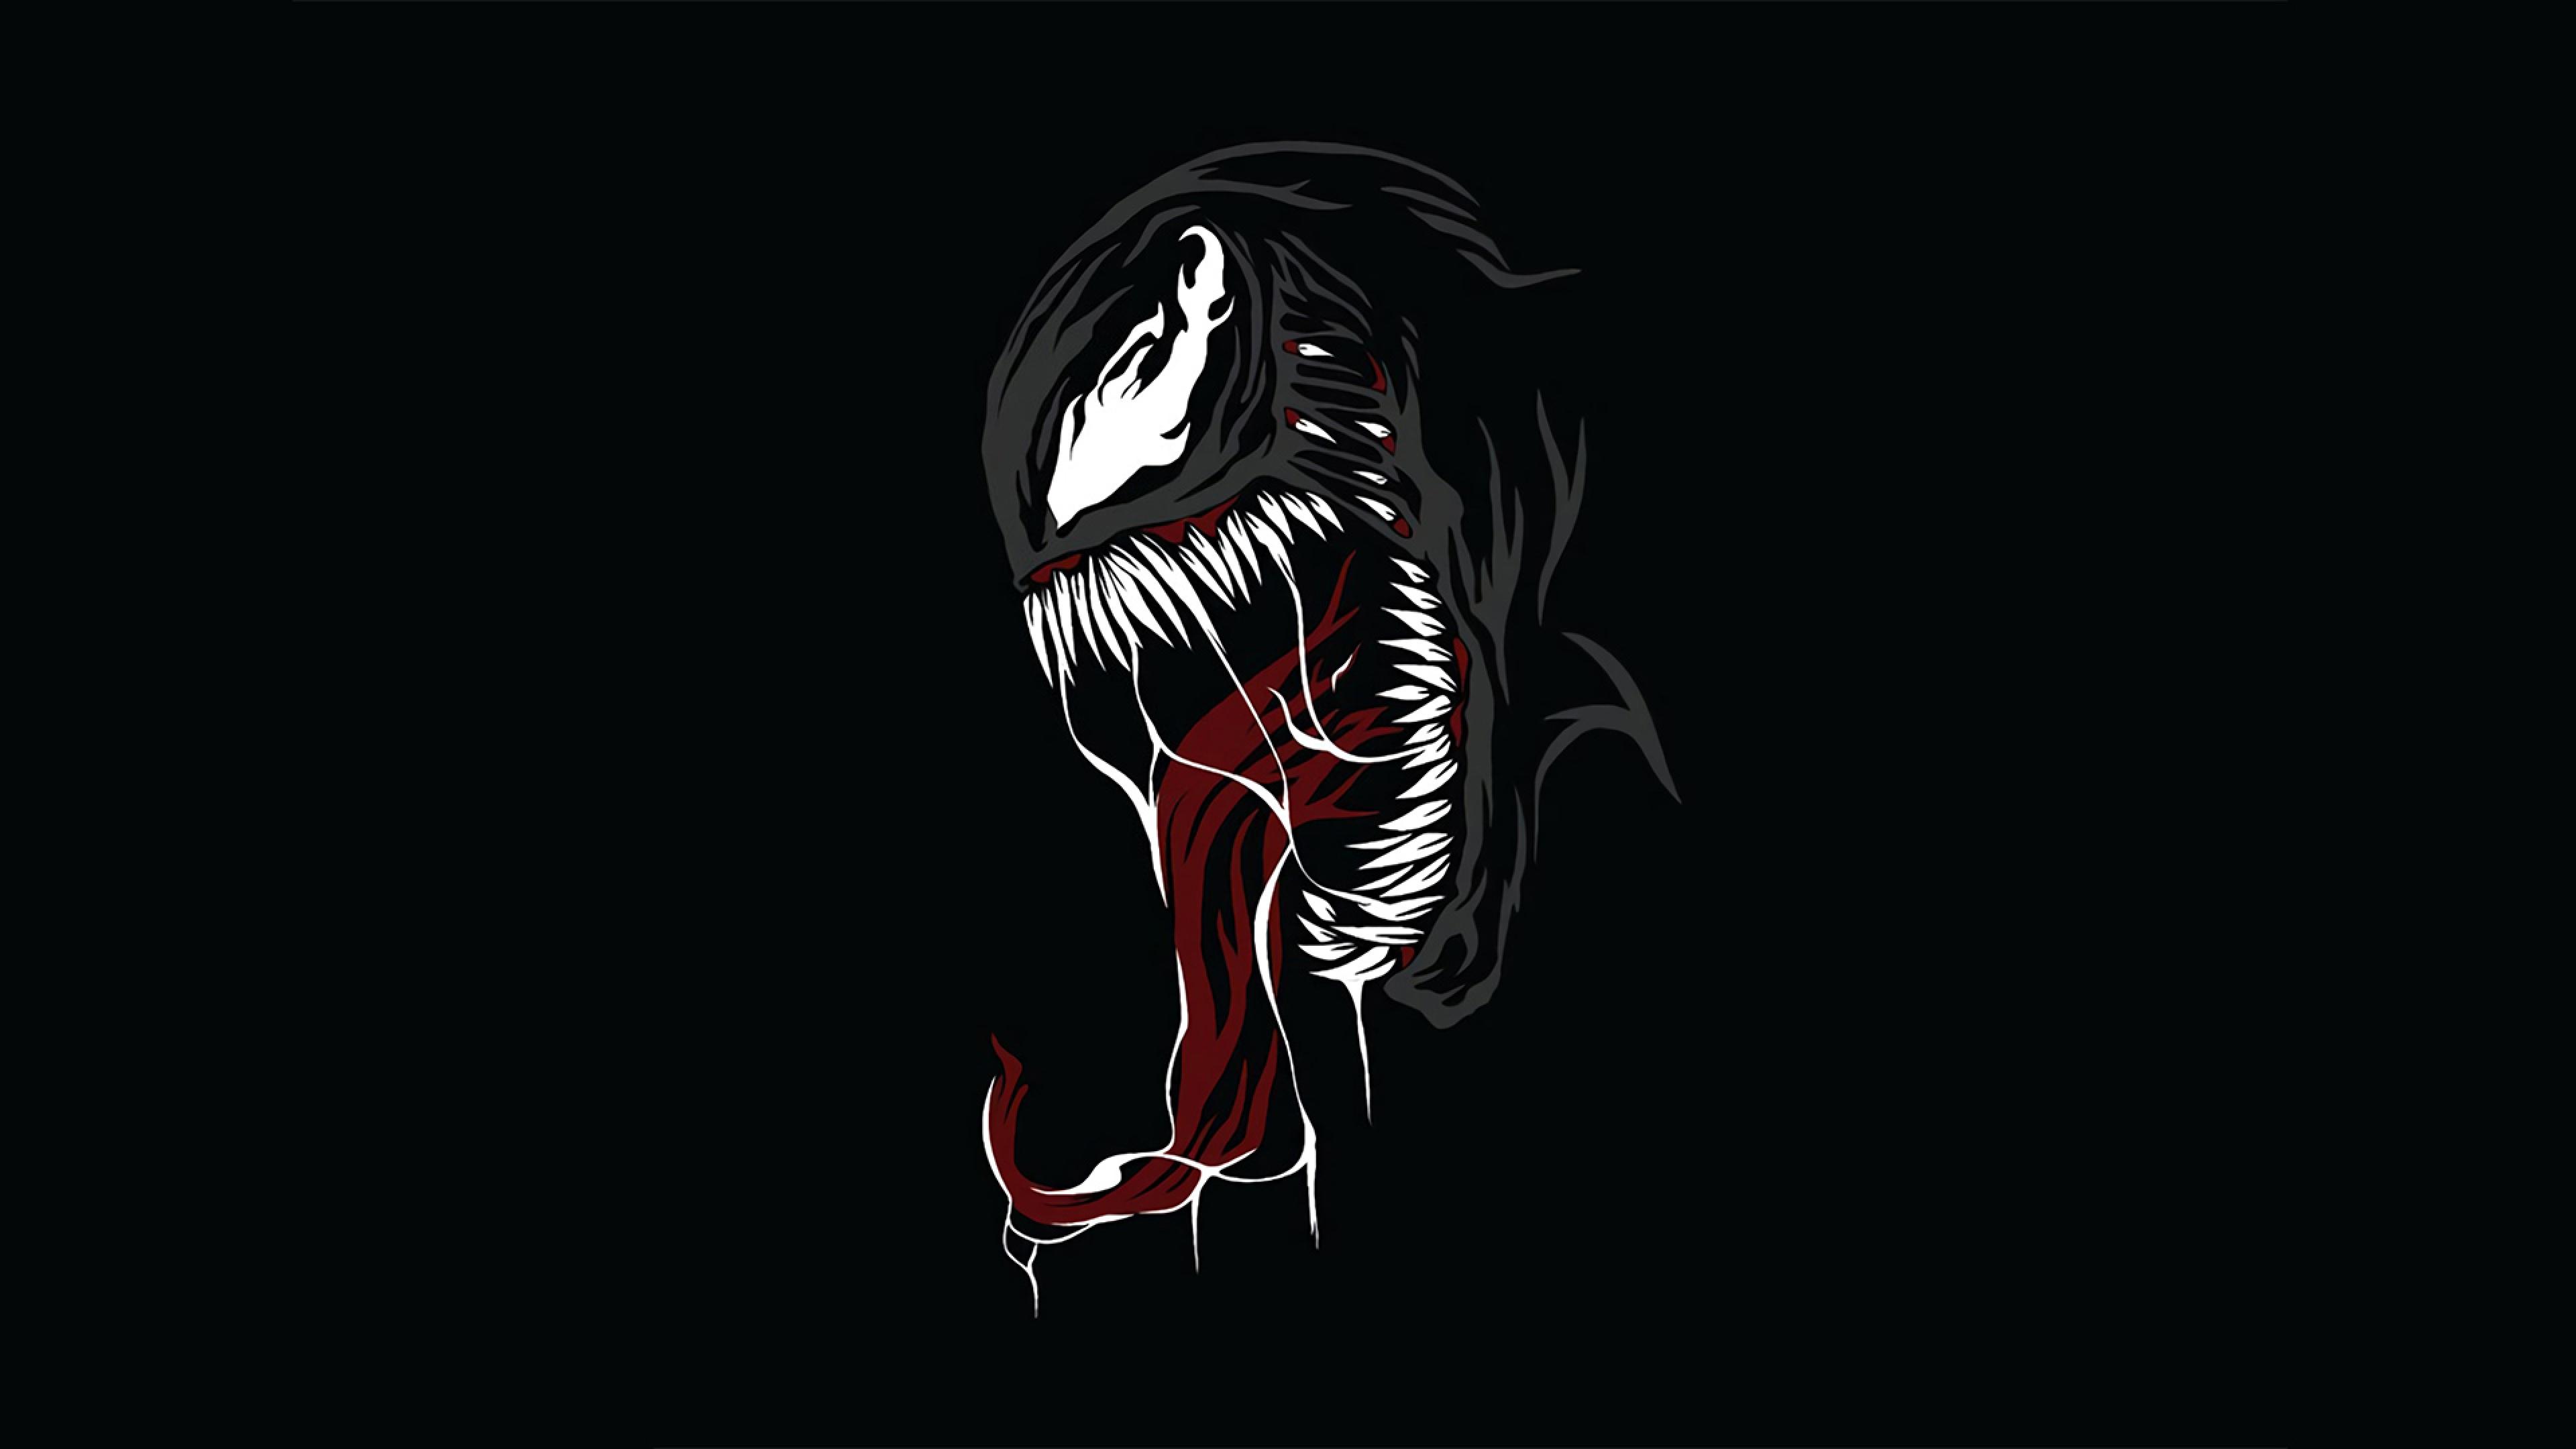 3840x2160 Venom Minimal 4K Wallpaper, HD Superheroes 4K ...